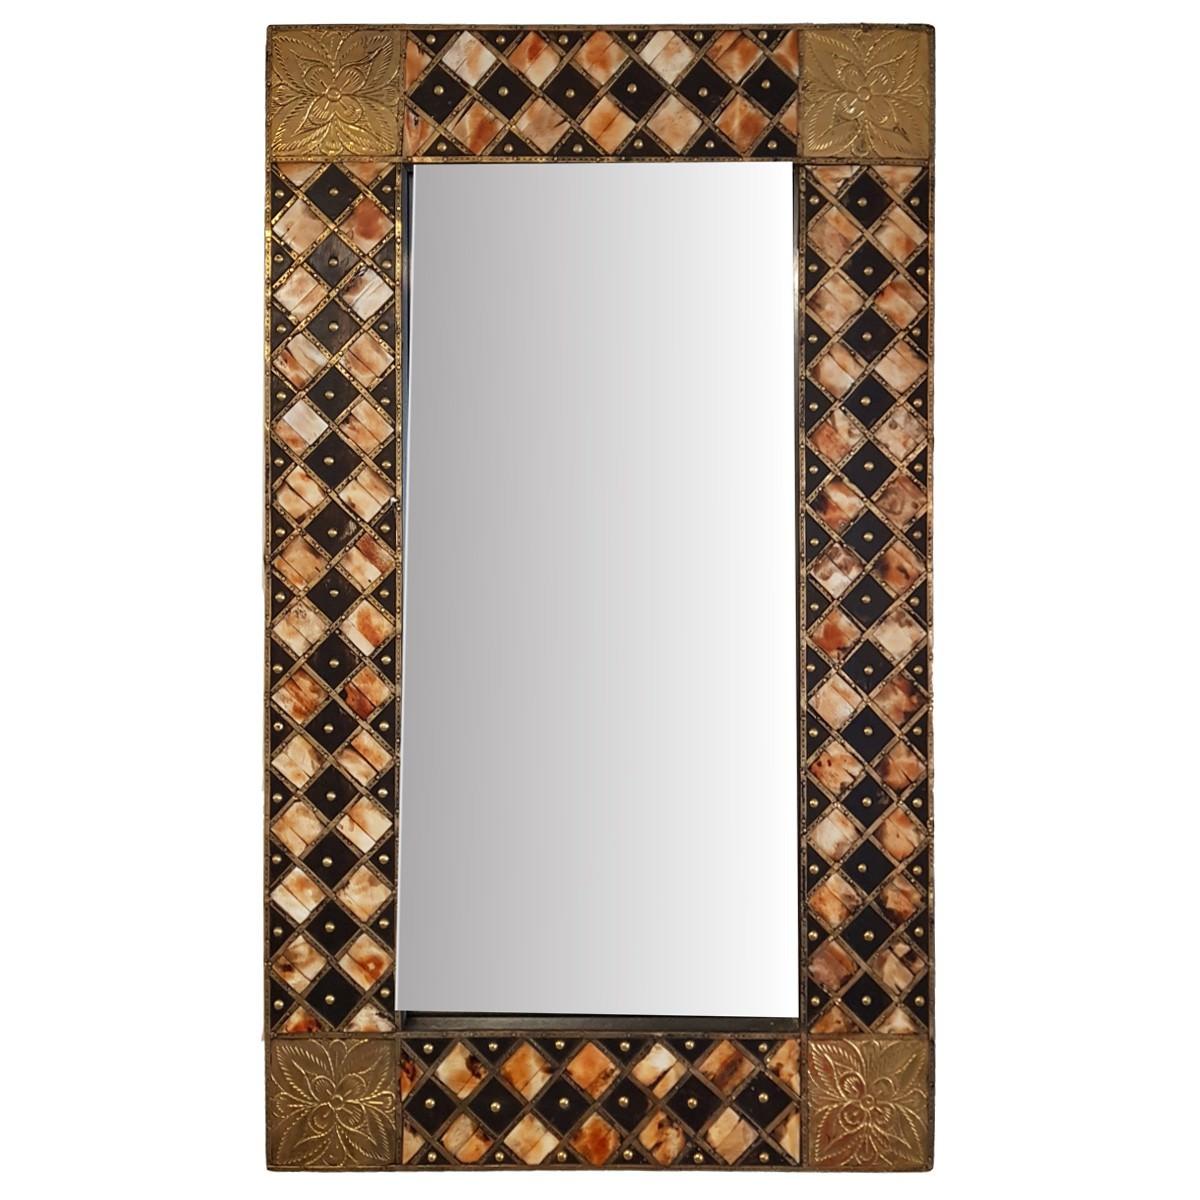 Sepil Brass & Bone Inlay Timber Frame Wall Mirror, 61cm